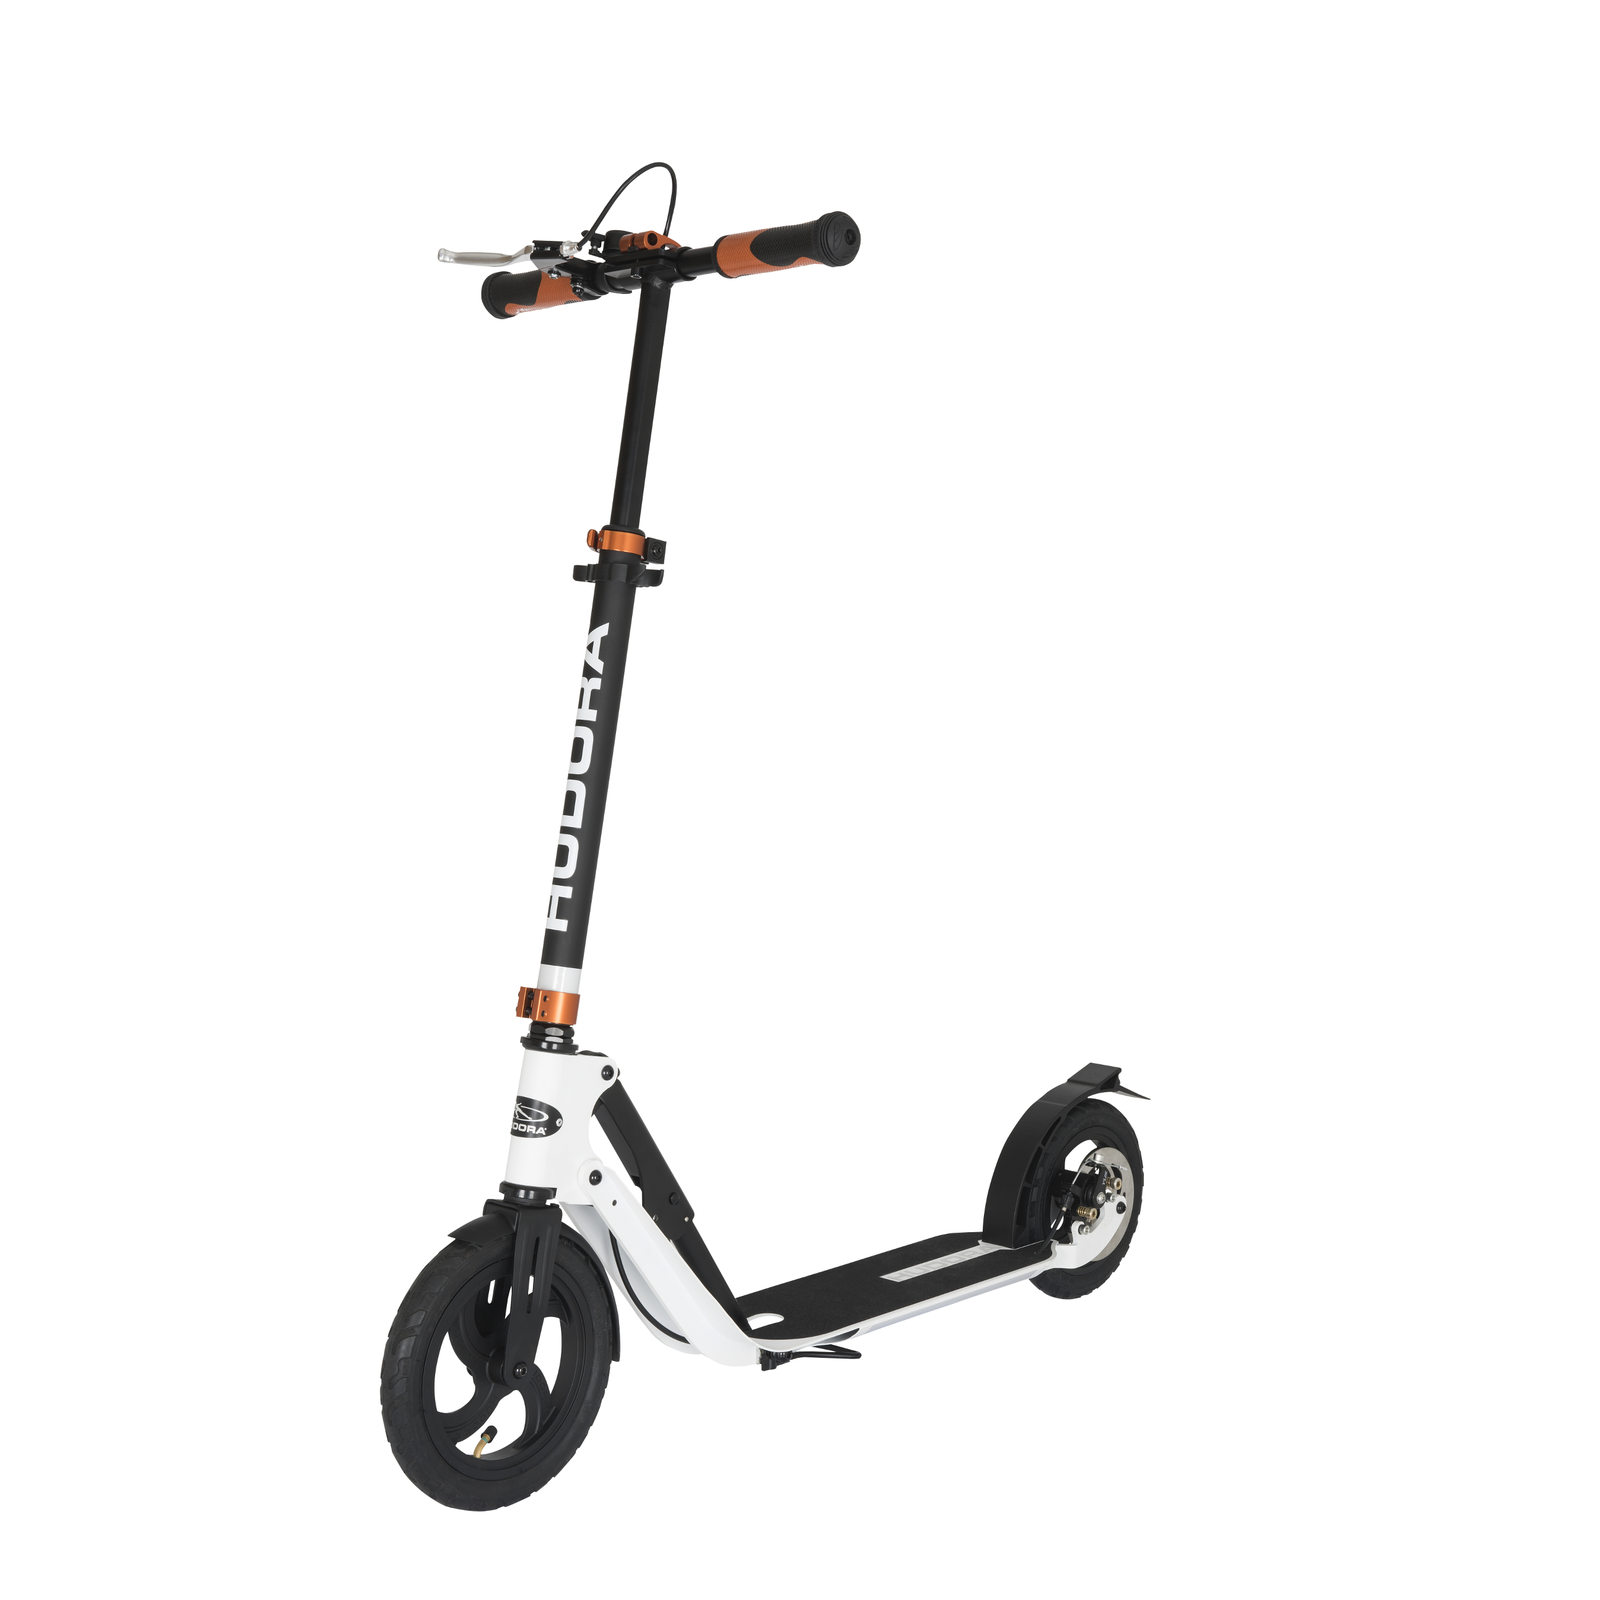 city scooter dual brake mit scheiben bremse ebay. Black Bedroom Furniture Sets. Home Design Ideas